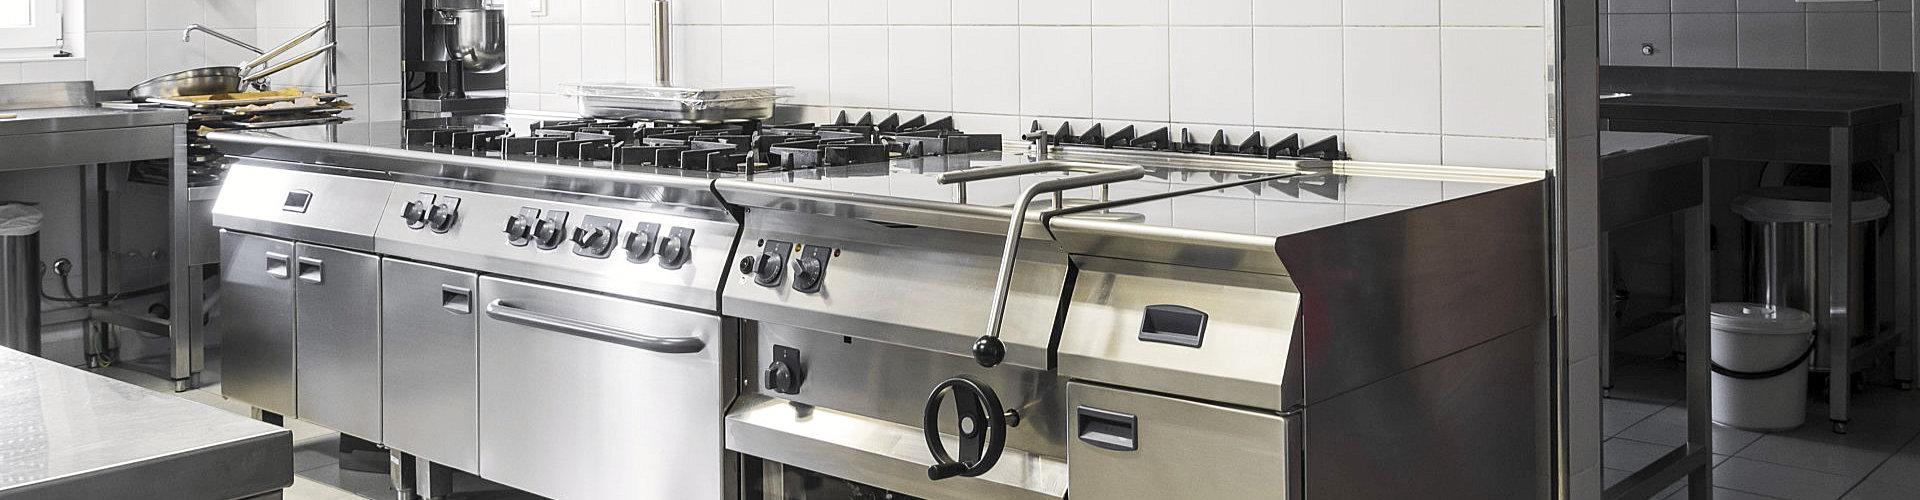 photo of a heat recovery machine